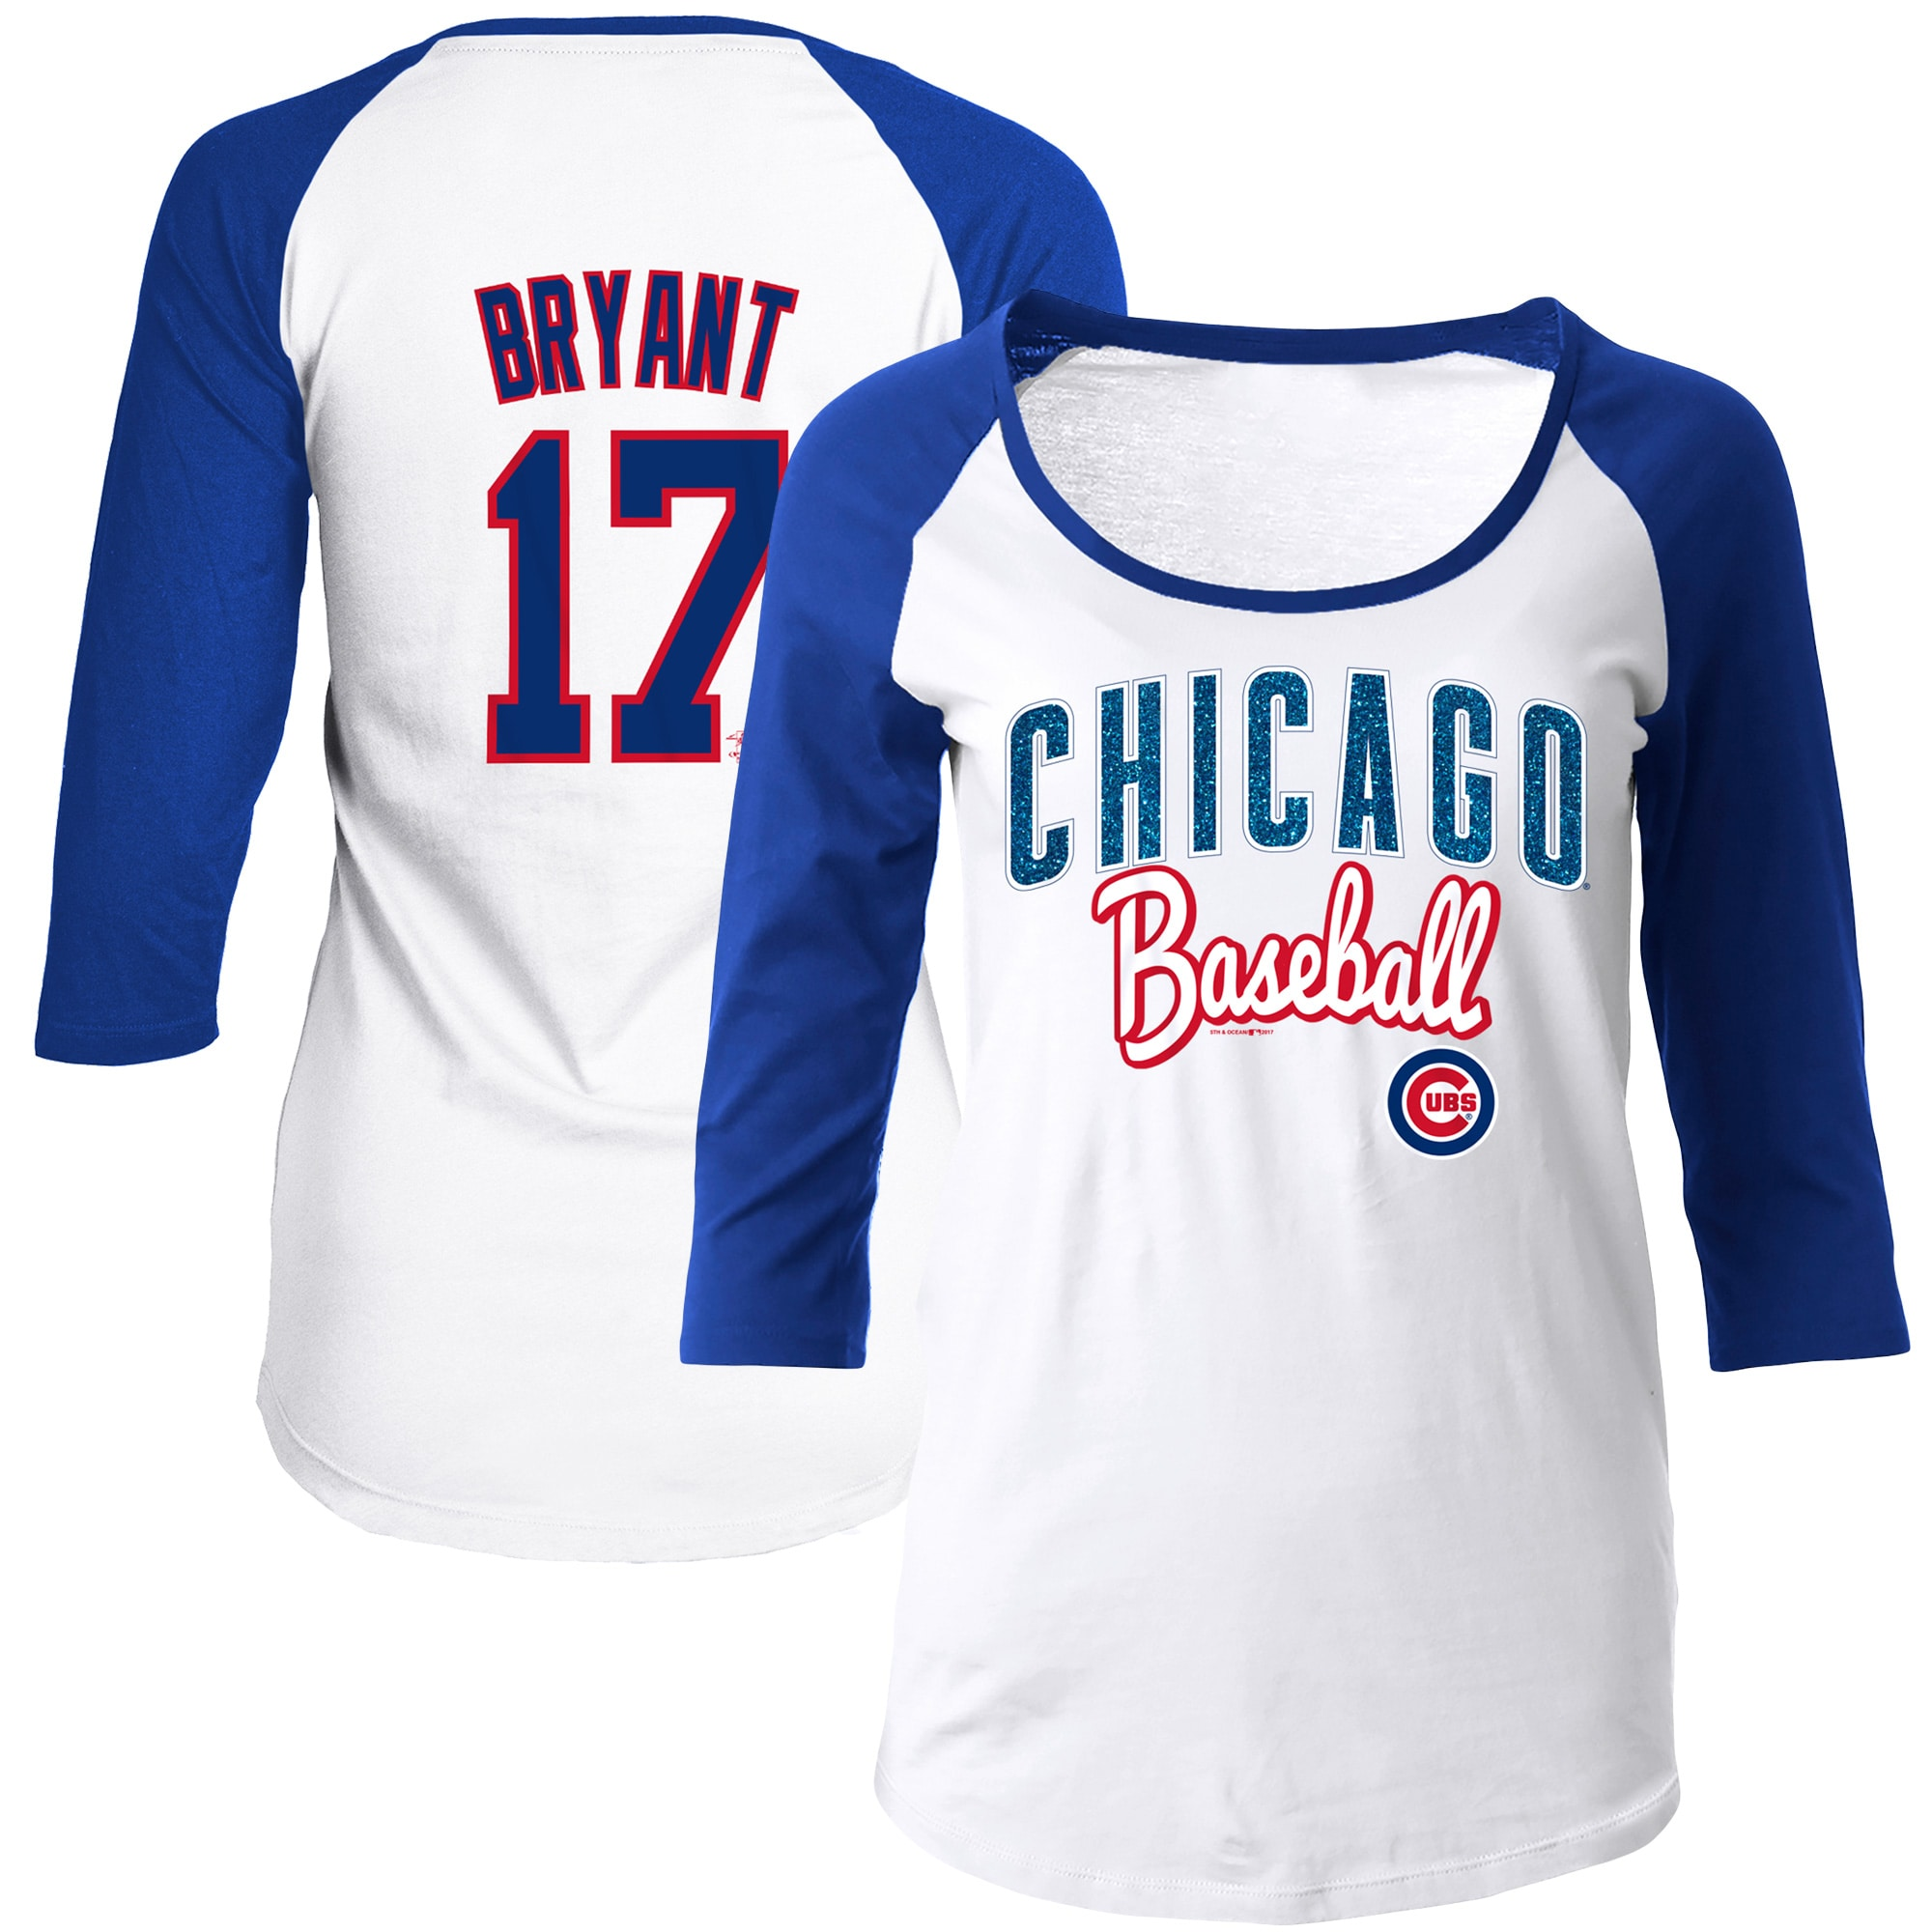 Kris Bryant Chicago Cubs 5th & Ocean by New Era Women's Glitter 3/4-Sleeve Raglan T-Shirt - White/Royal